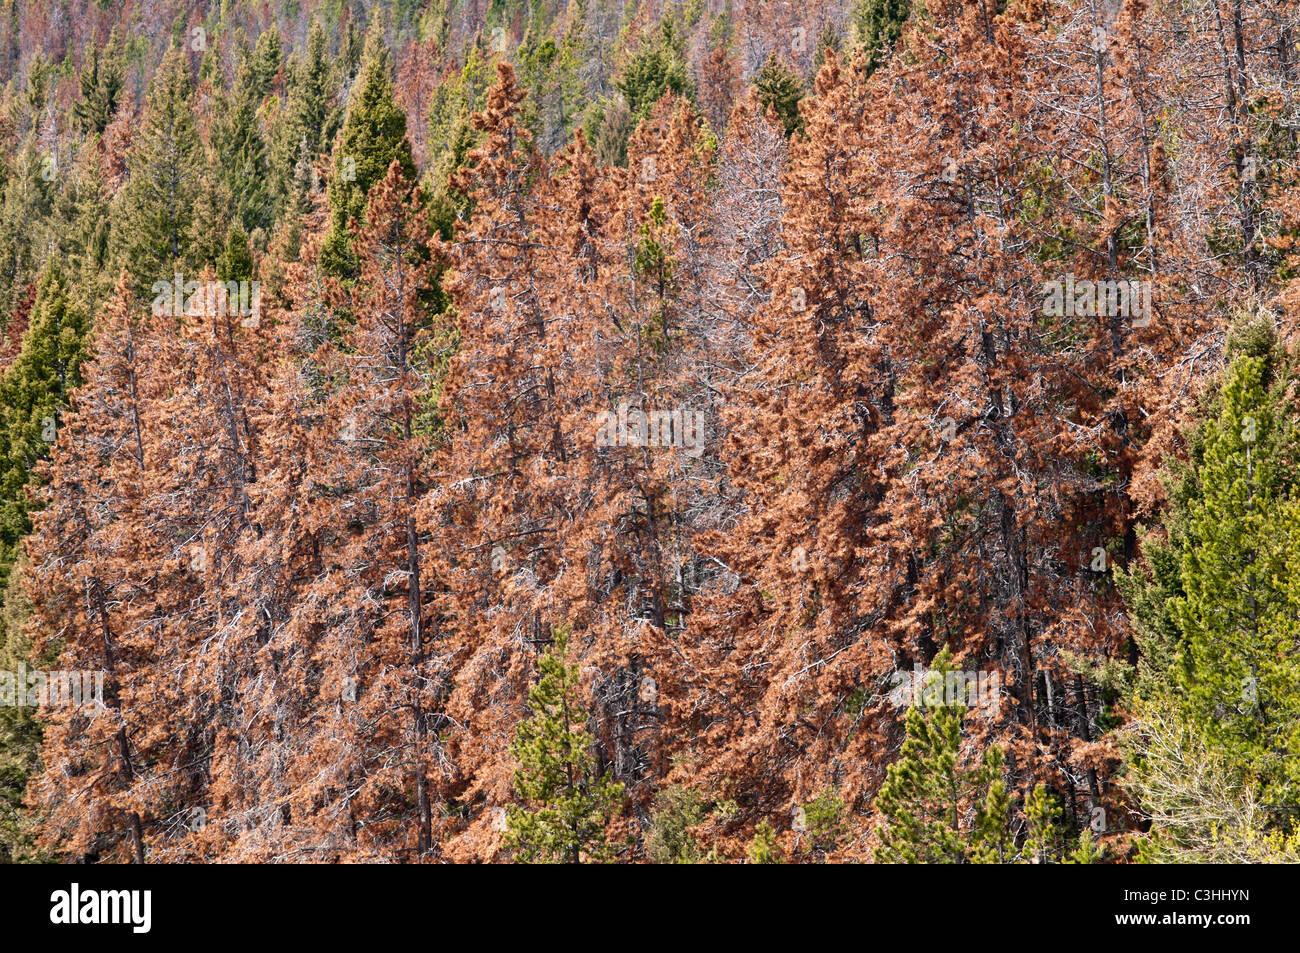 Mountain Pine Beetle-killed trees at MacDonald Pass near Helena Montana. - Stock Image